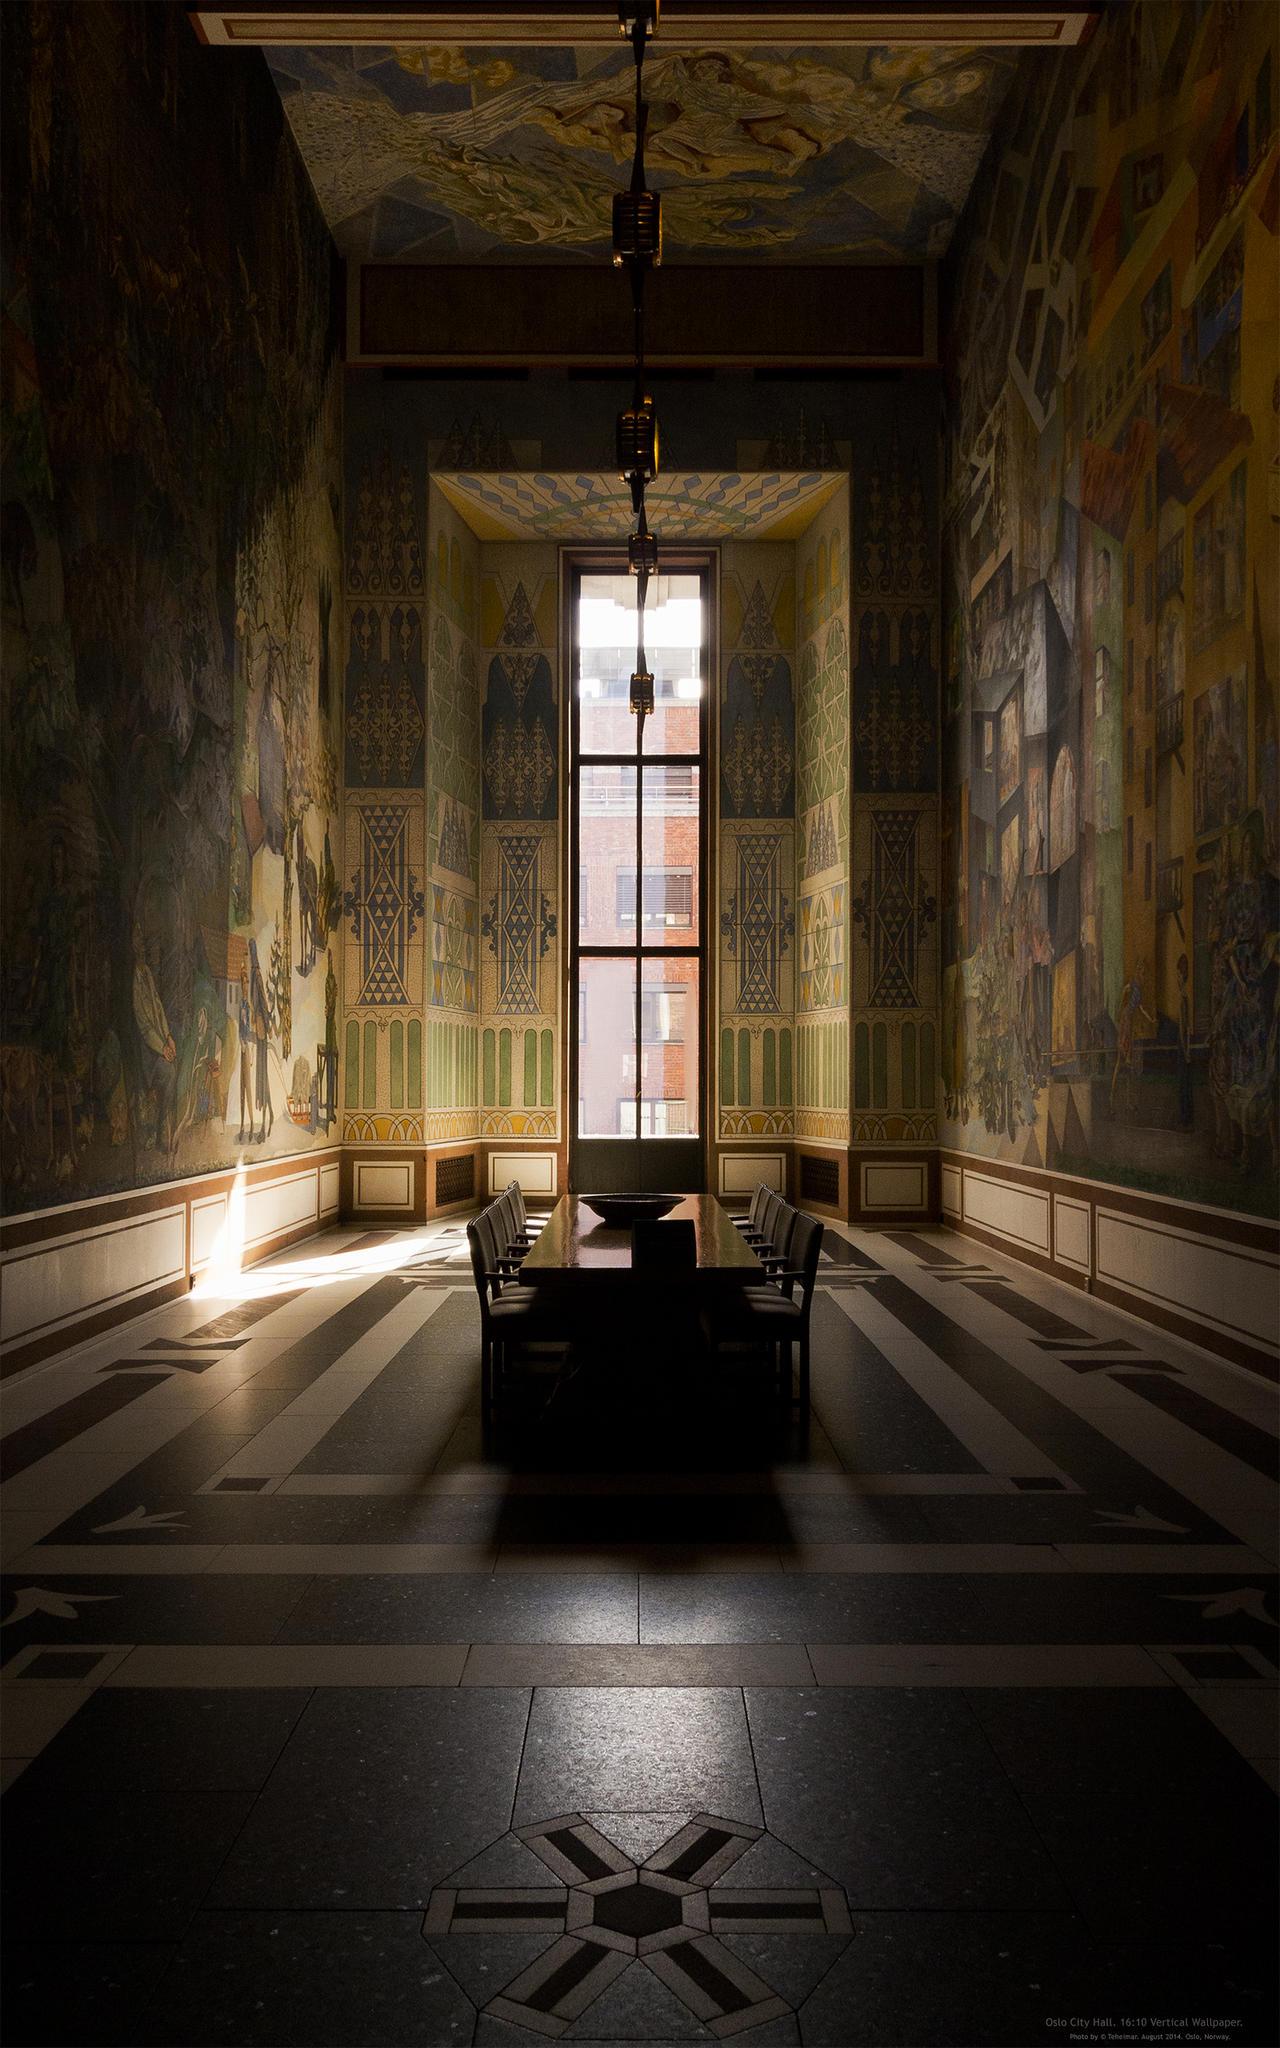 Oslo City Hall Room Vertical Wallpaper 16 10 By Teheimar